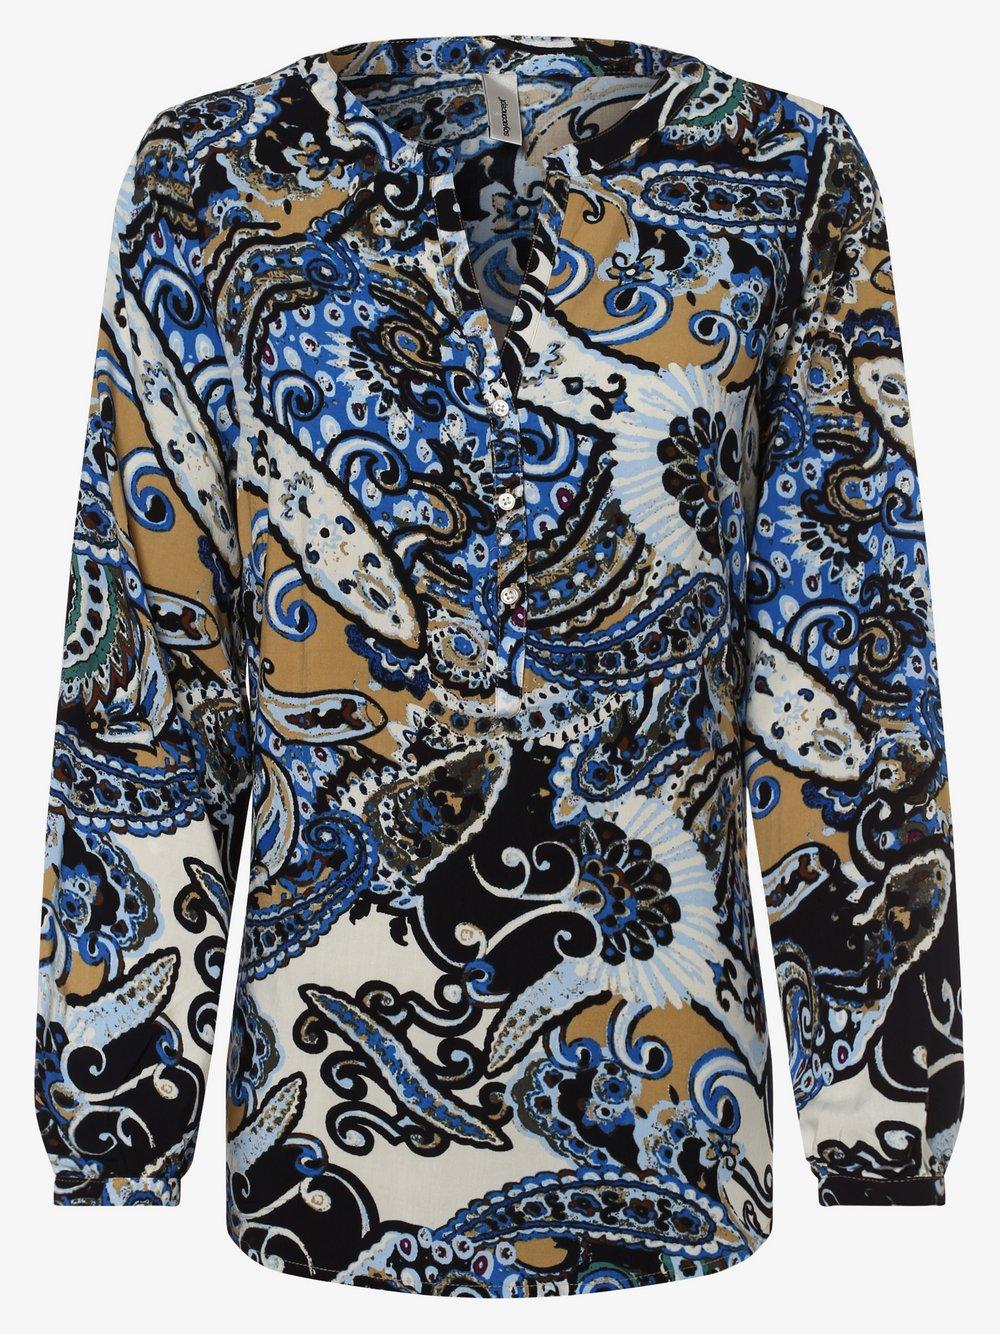 soyaconcept® – Bluzka damska – Azra, niebieski Van Graaf 441142-0001-09940